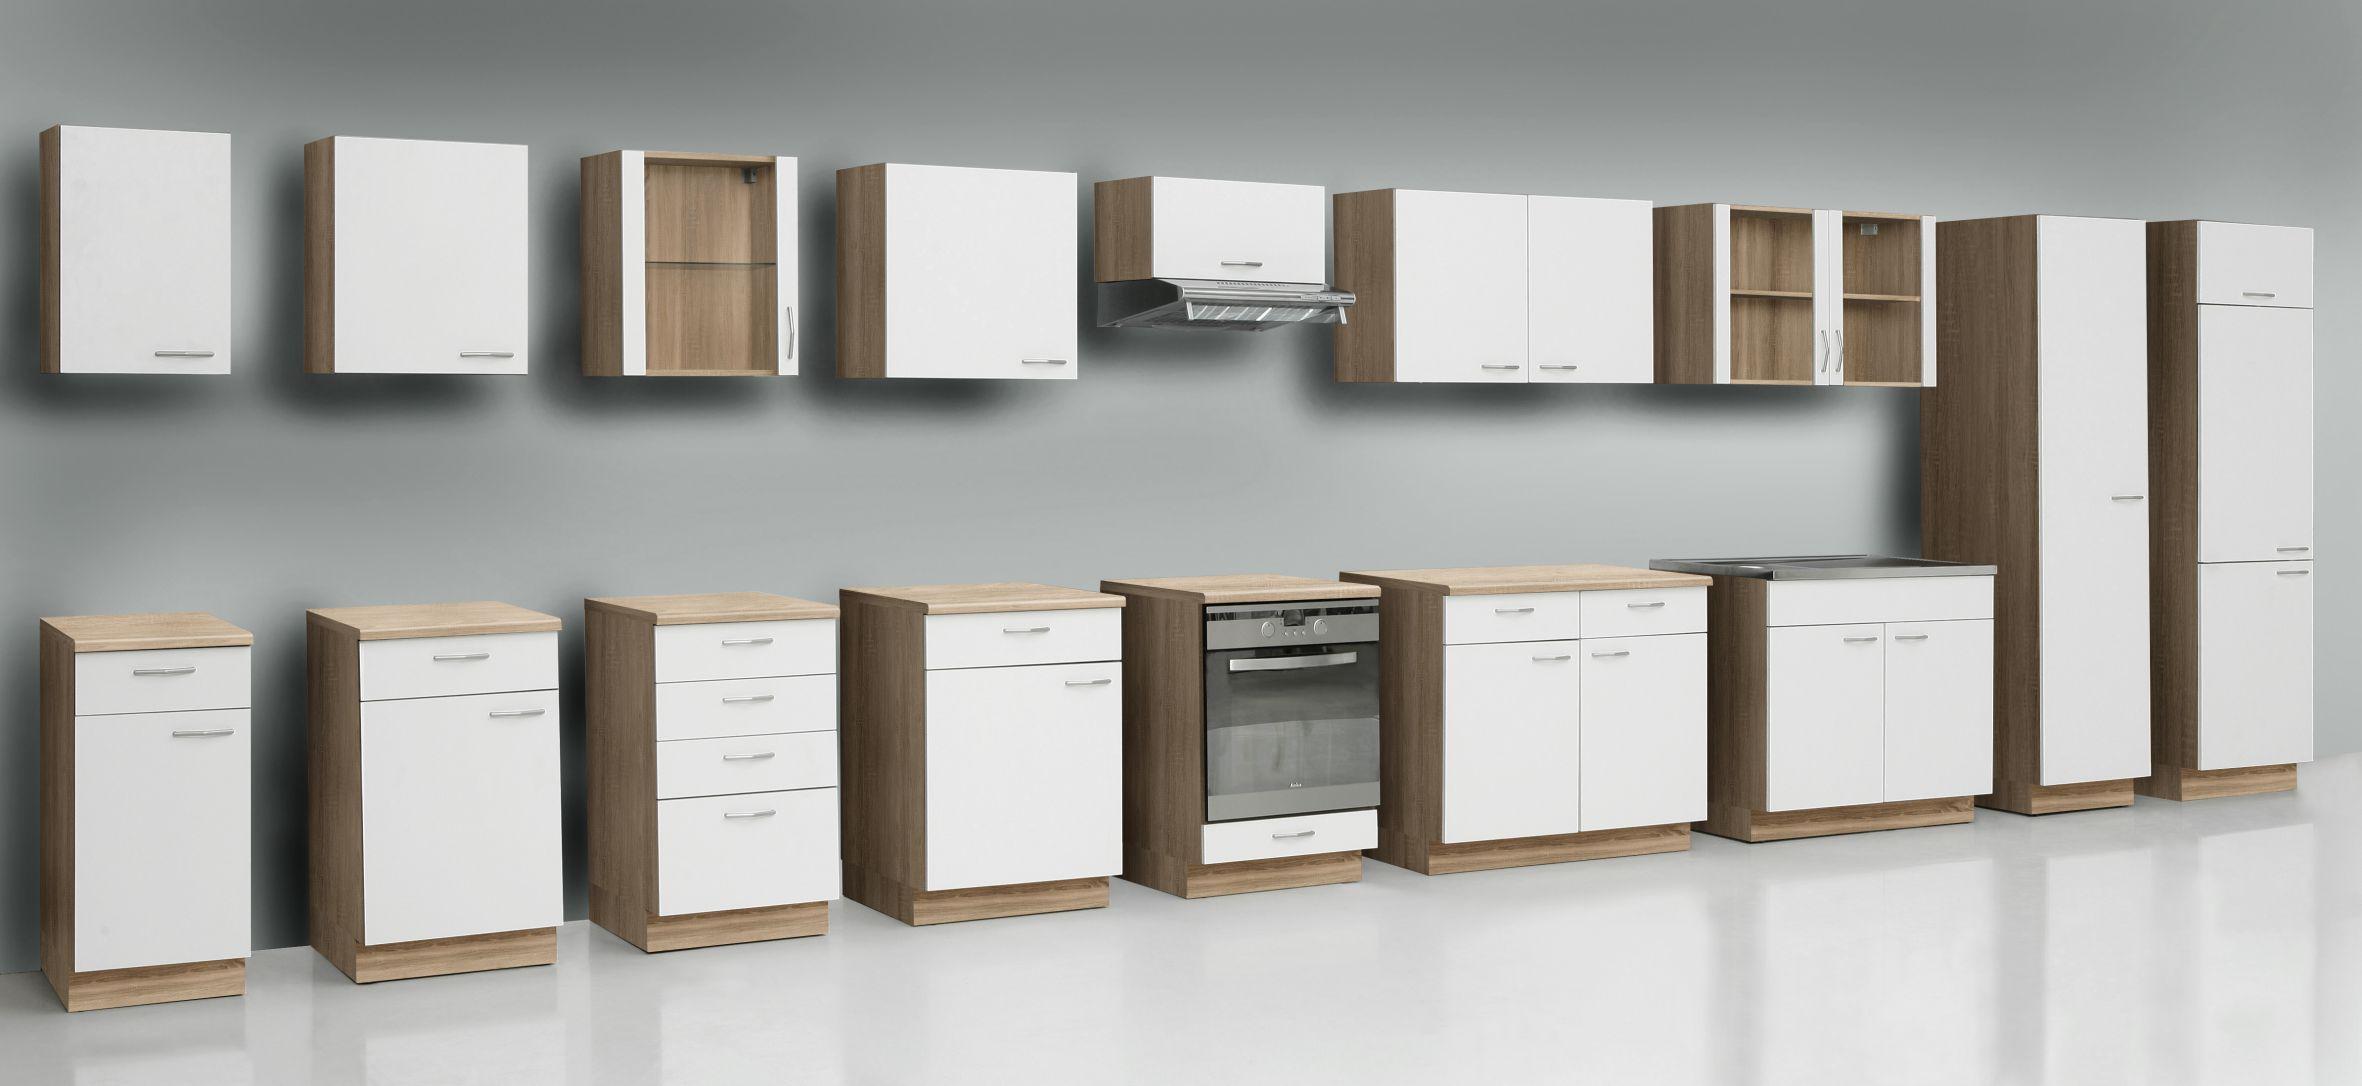 unterschrank k che. Black Bedroom Furniture Sets. Home Design Ideas